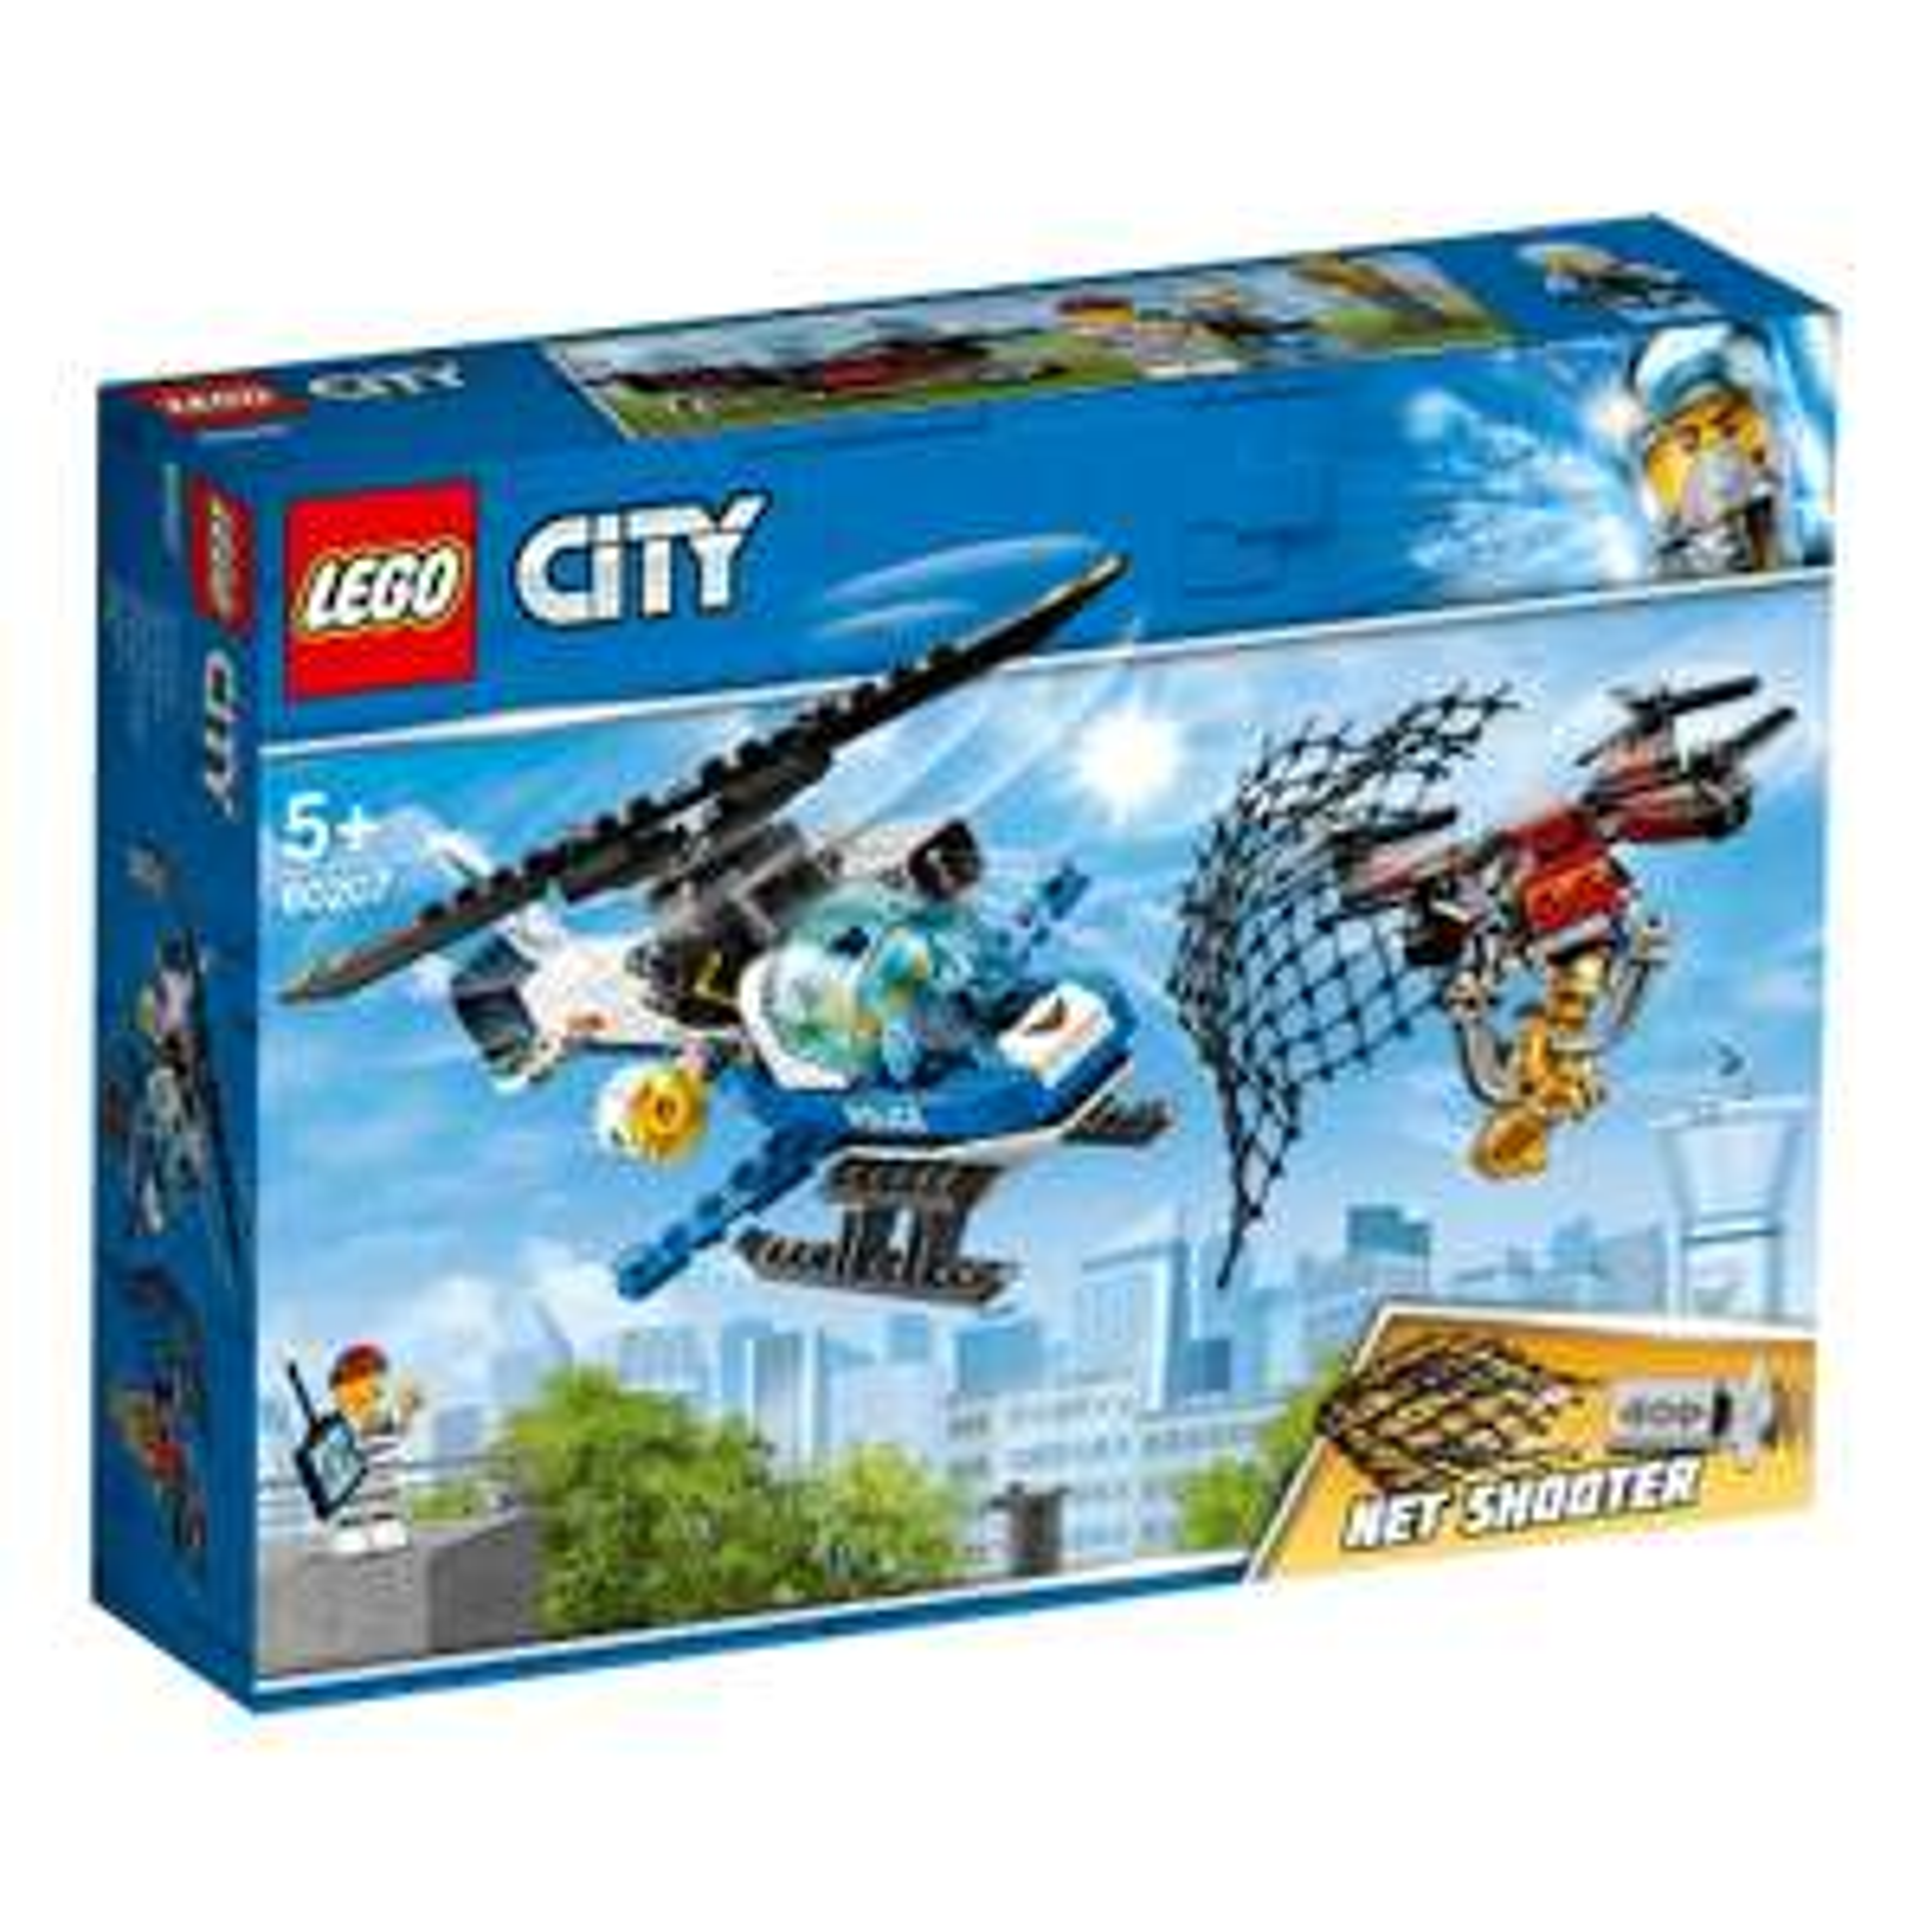 LEGO City 60207 Sky Police Drone Chase - £8.99 Instore @ Asda